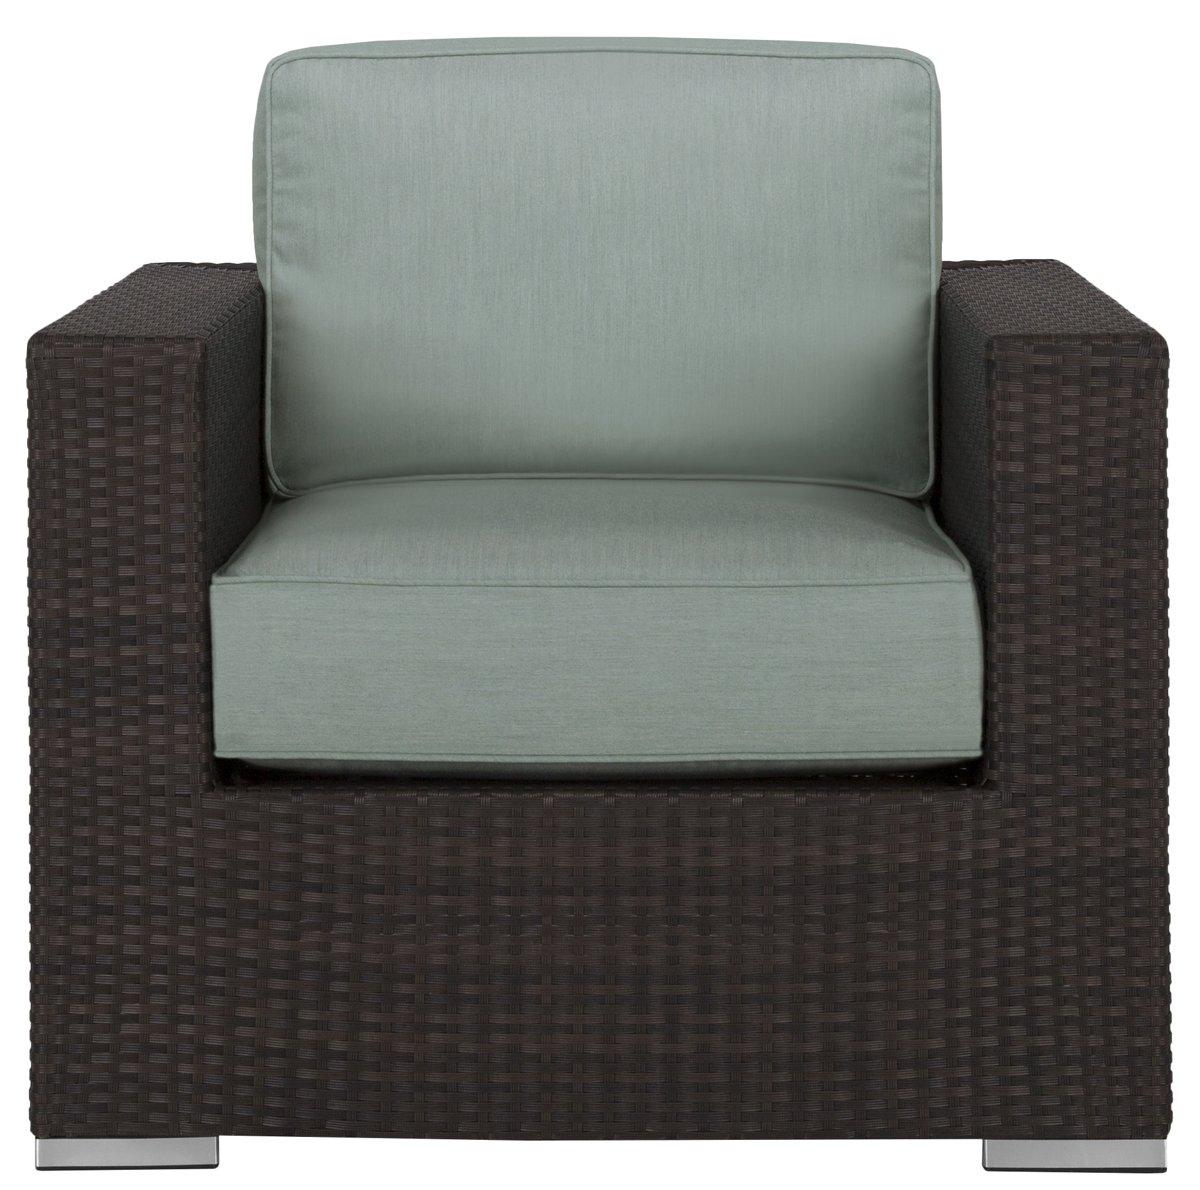 Fina Teal Chair